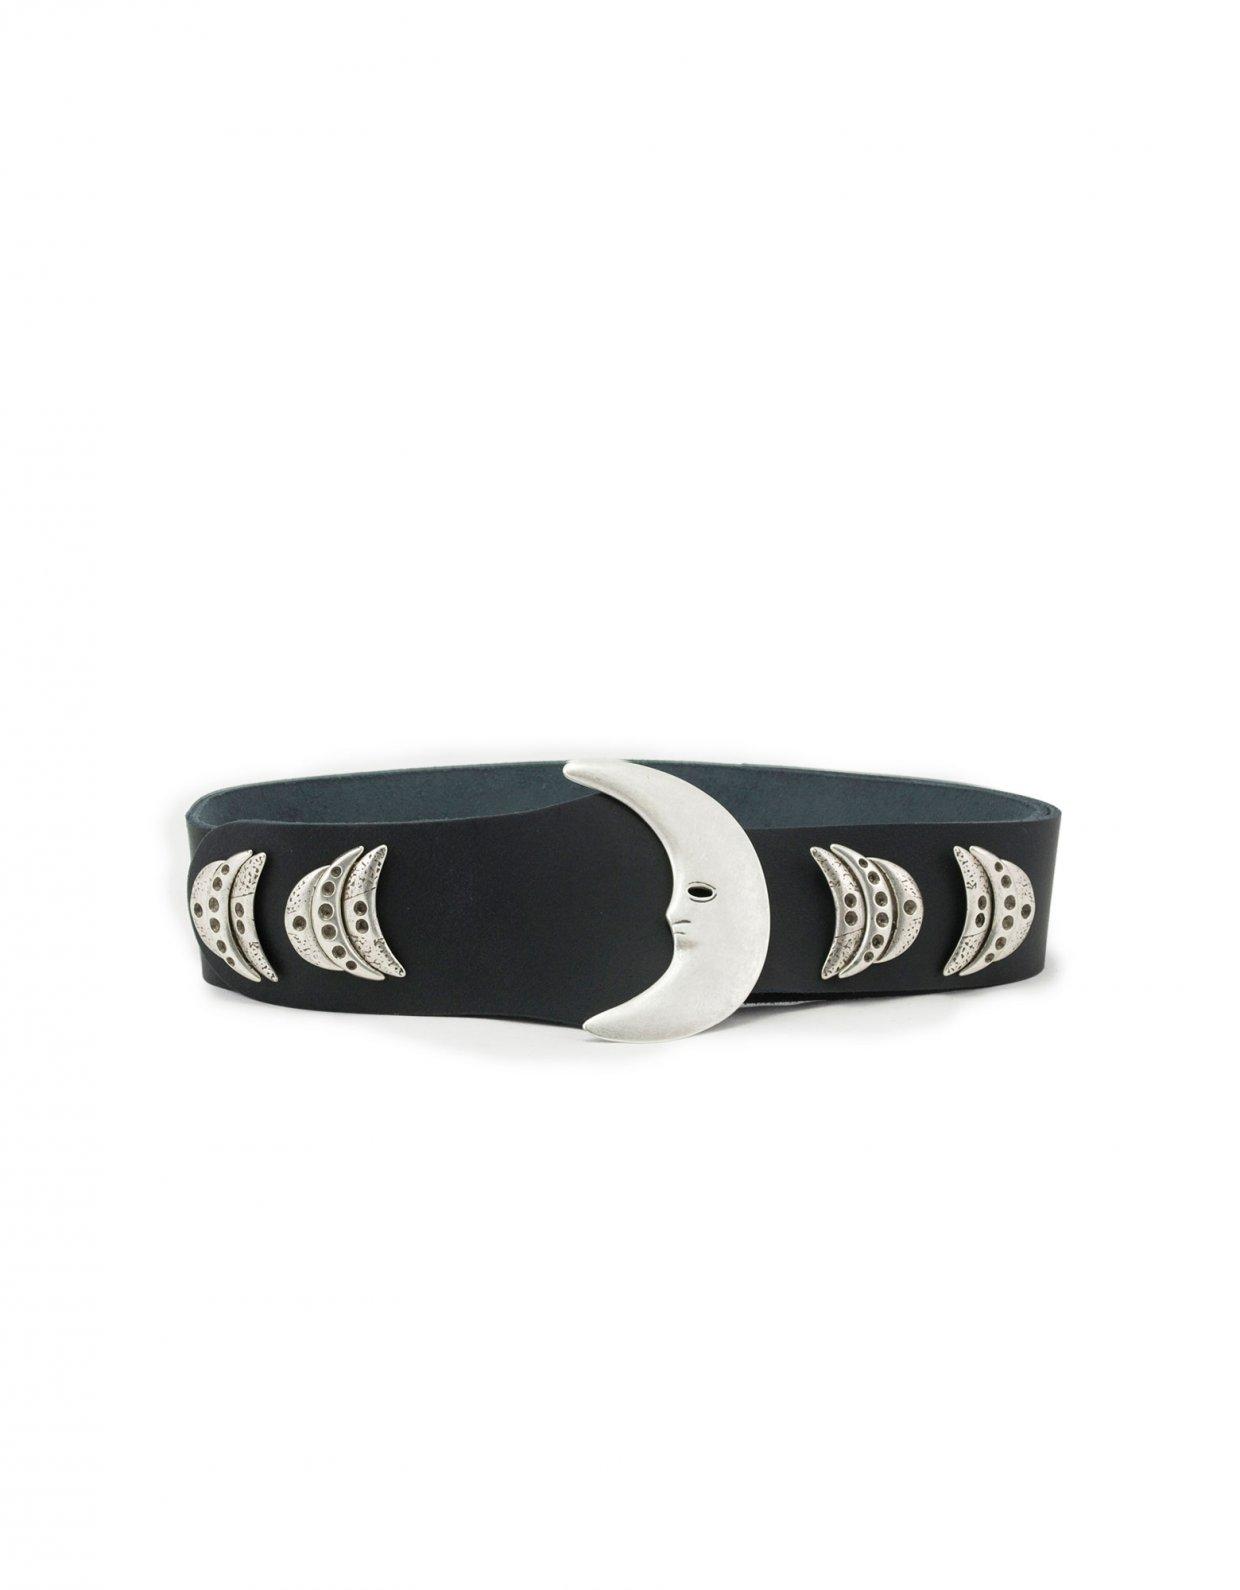 Individual Art Leather Moondance belt black